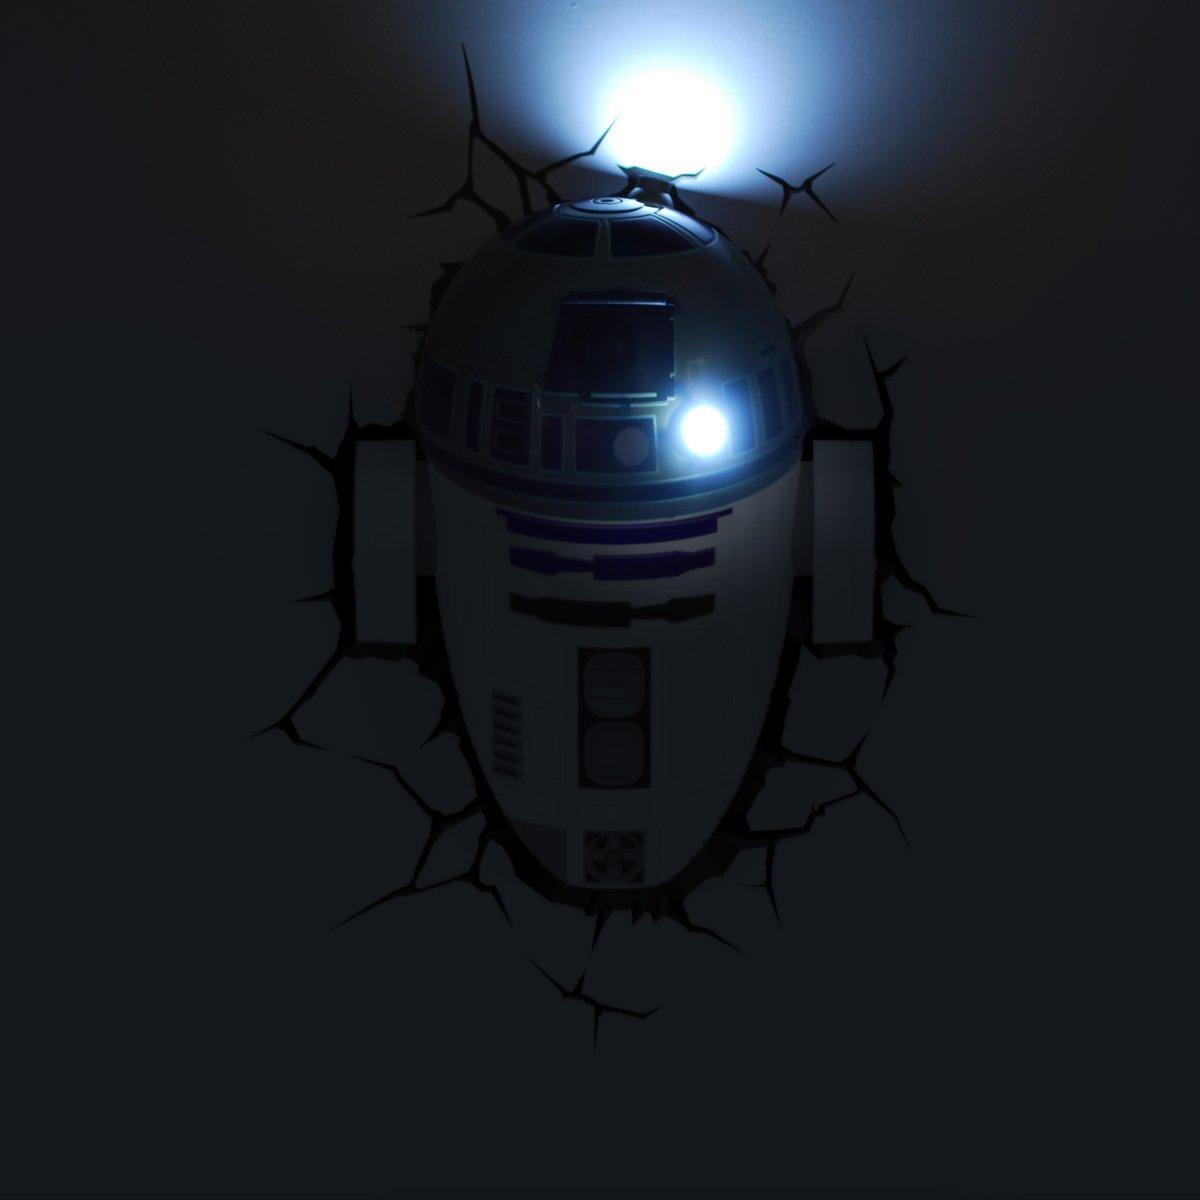 3DlightFX 3D Deco LED Wall Light Star Wars R2-D2 at Barnitts Online Store, UK